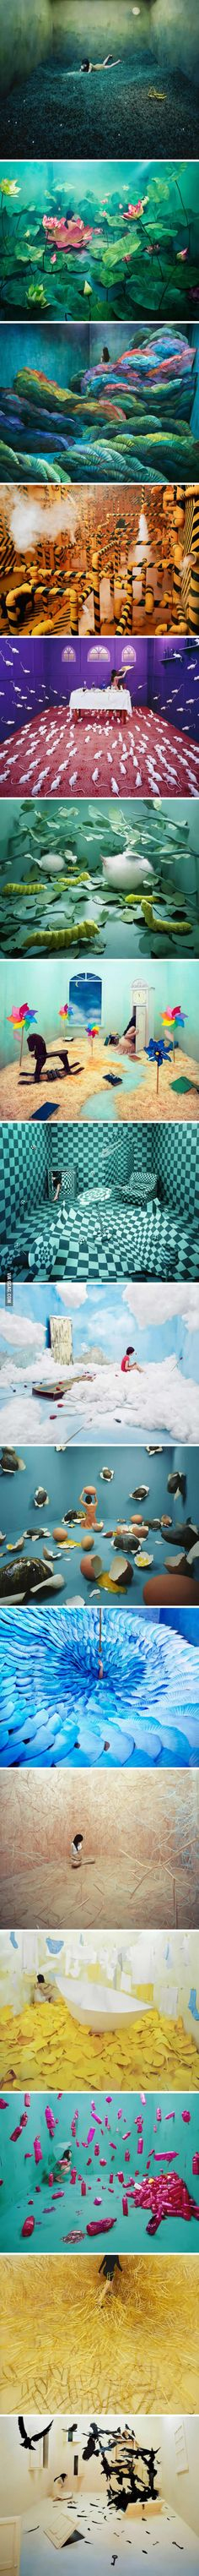 Korean Artist Transforms Her Small Studio Into Beautiful Dream Worlds